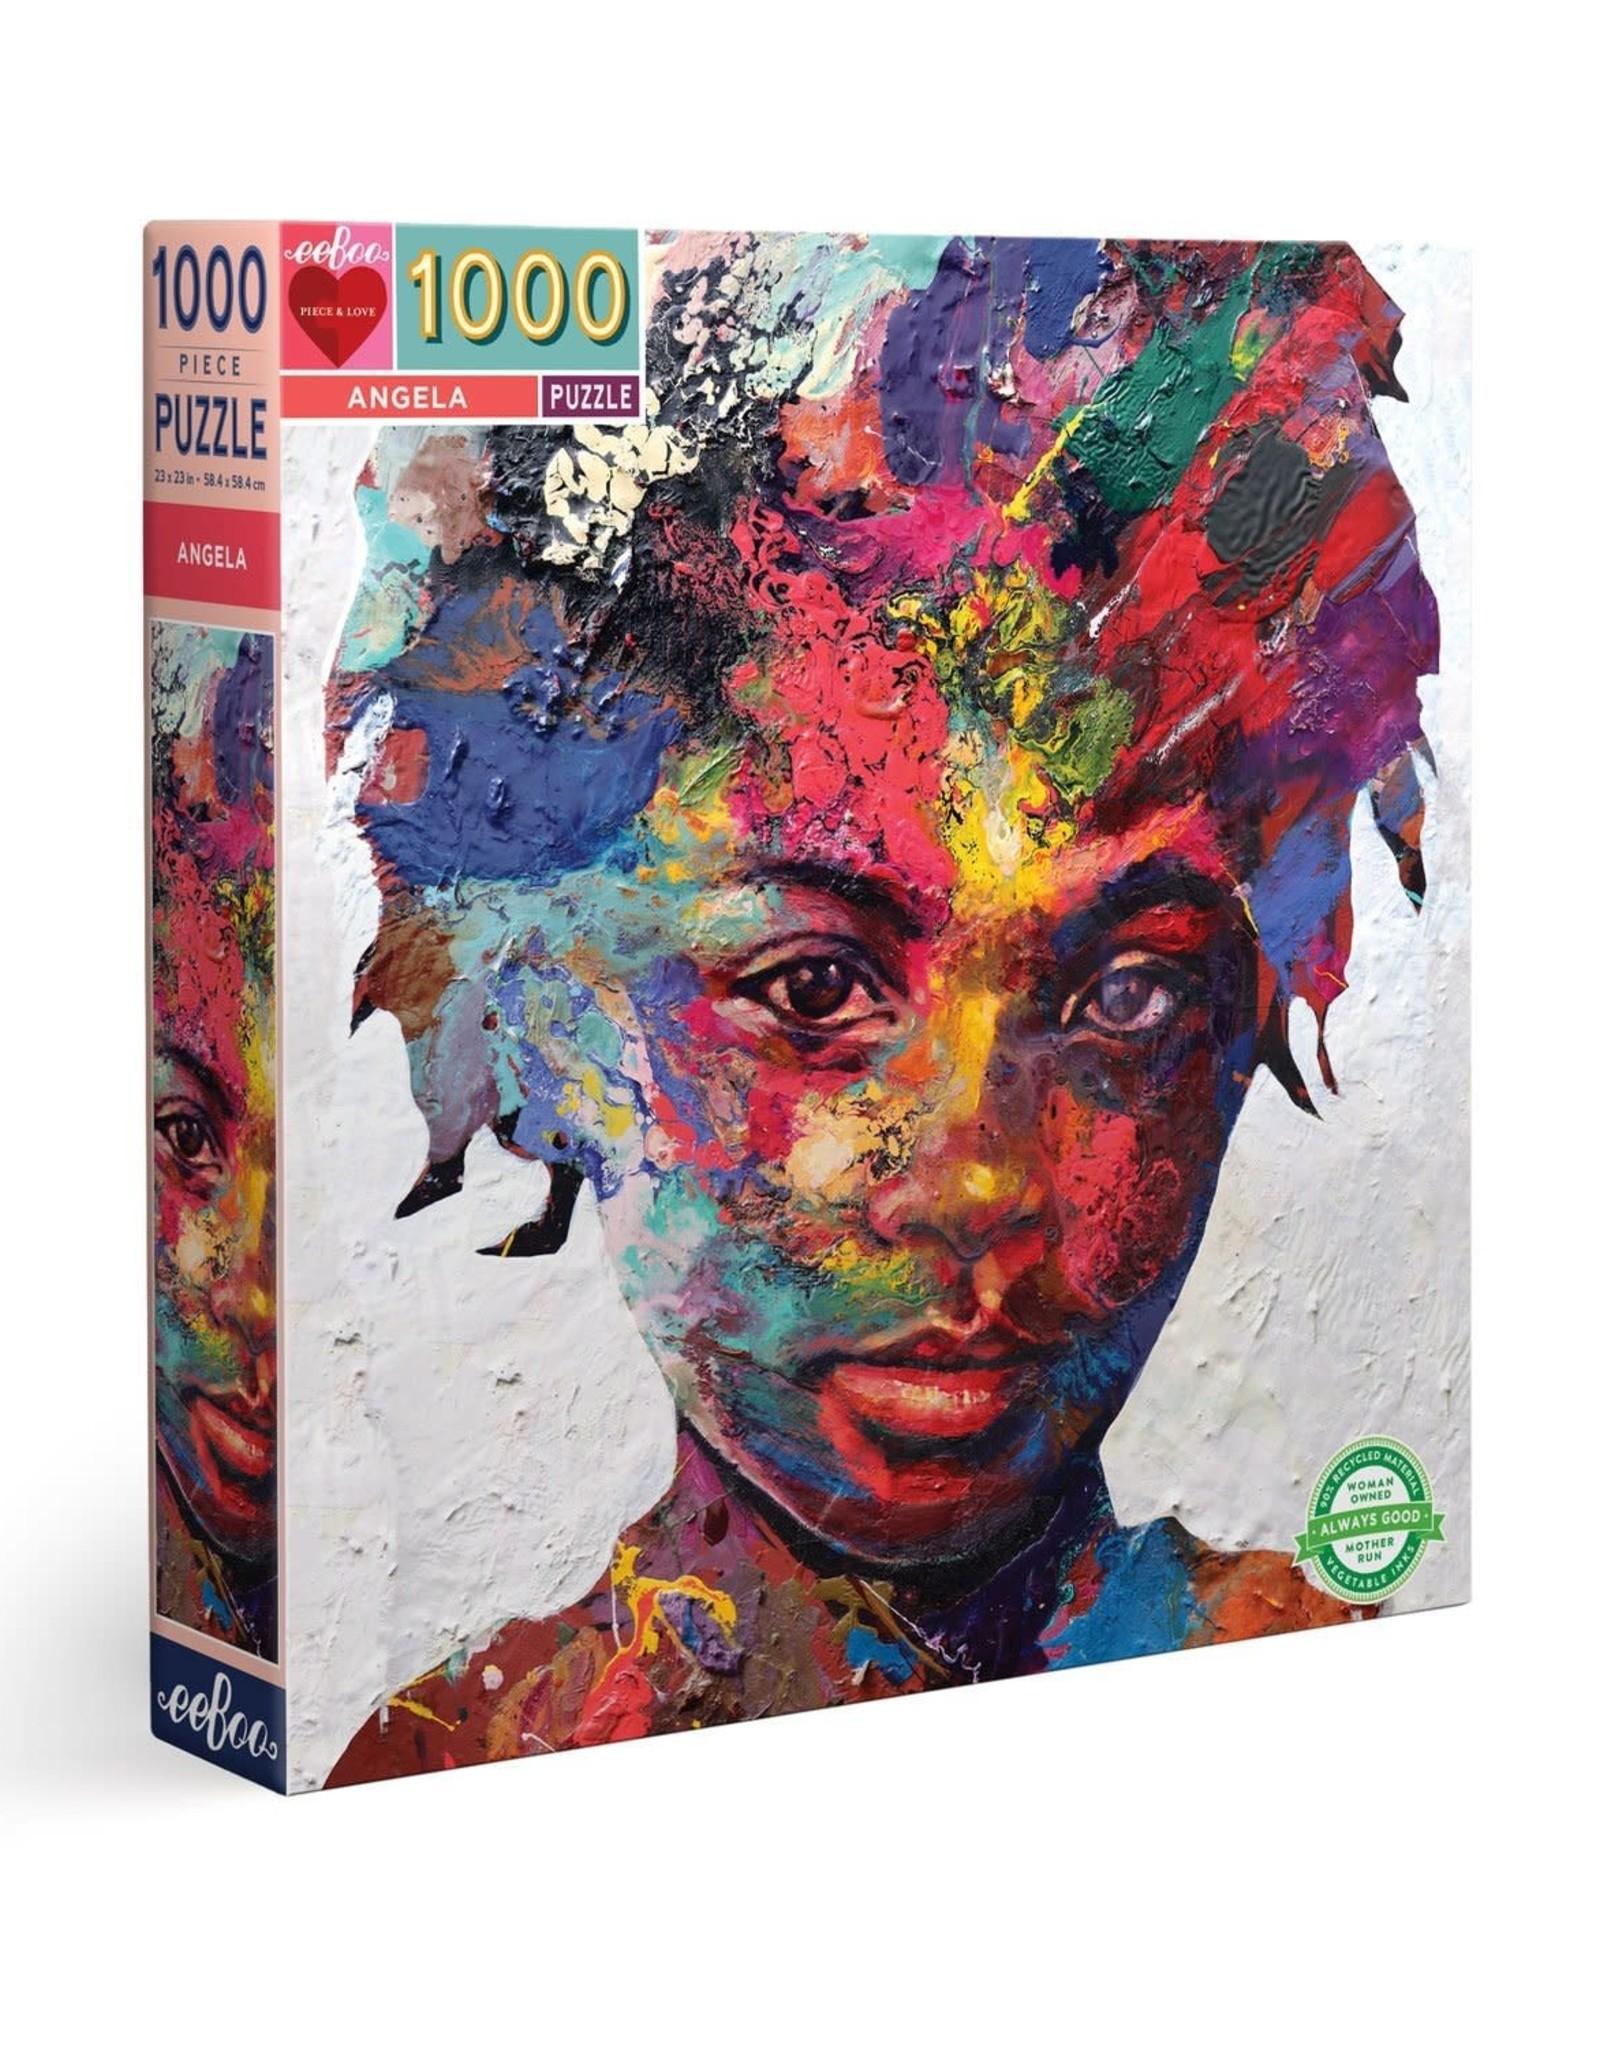 Angela 1000 Piece Puzzle